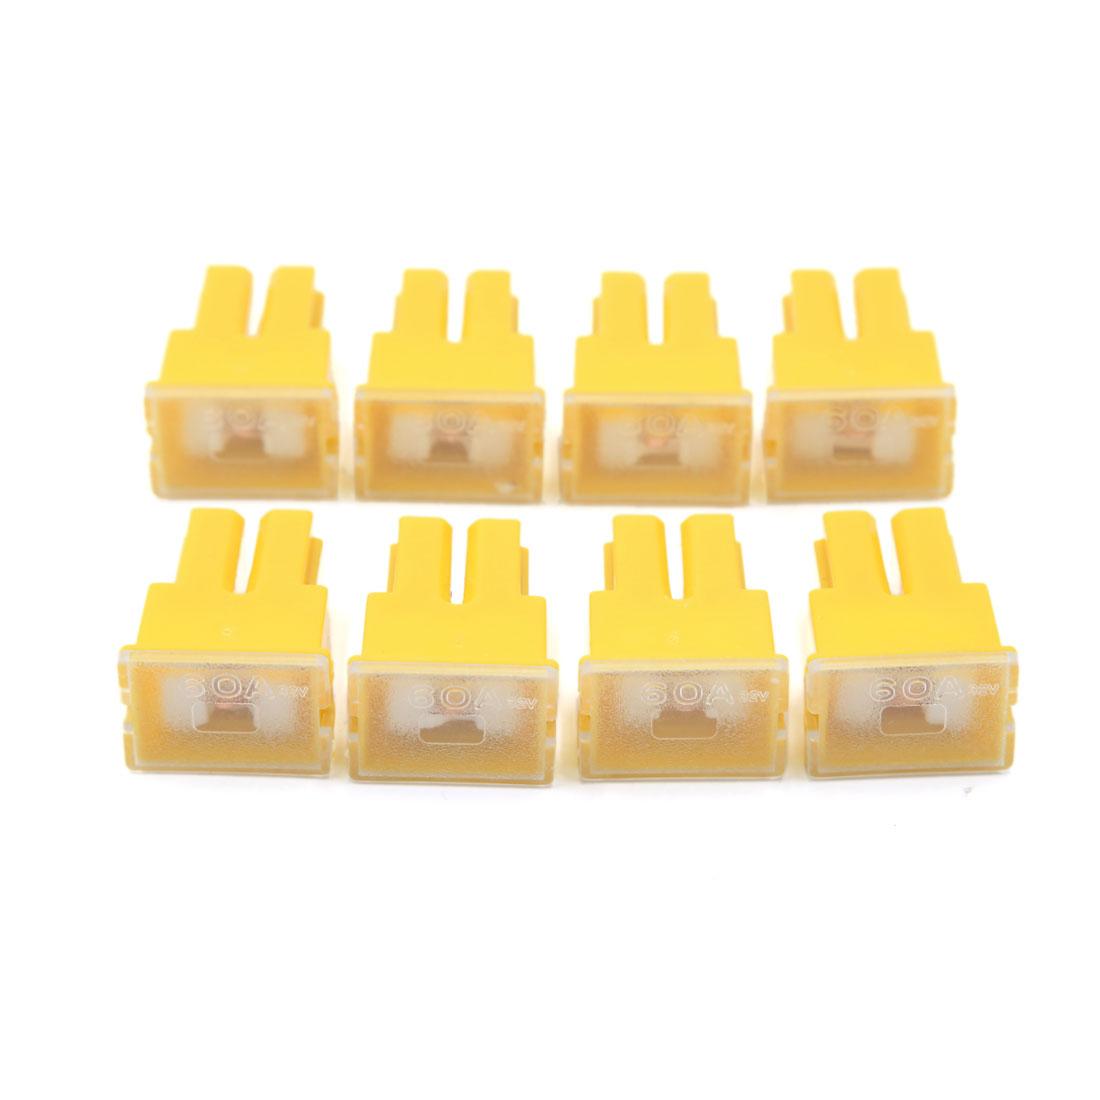 8Pcs Yellow Plastic Auto Car Push-in Type Female PAL Cartridge Fuse DC 32V 60A